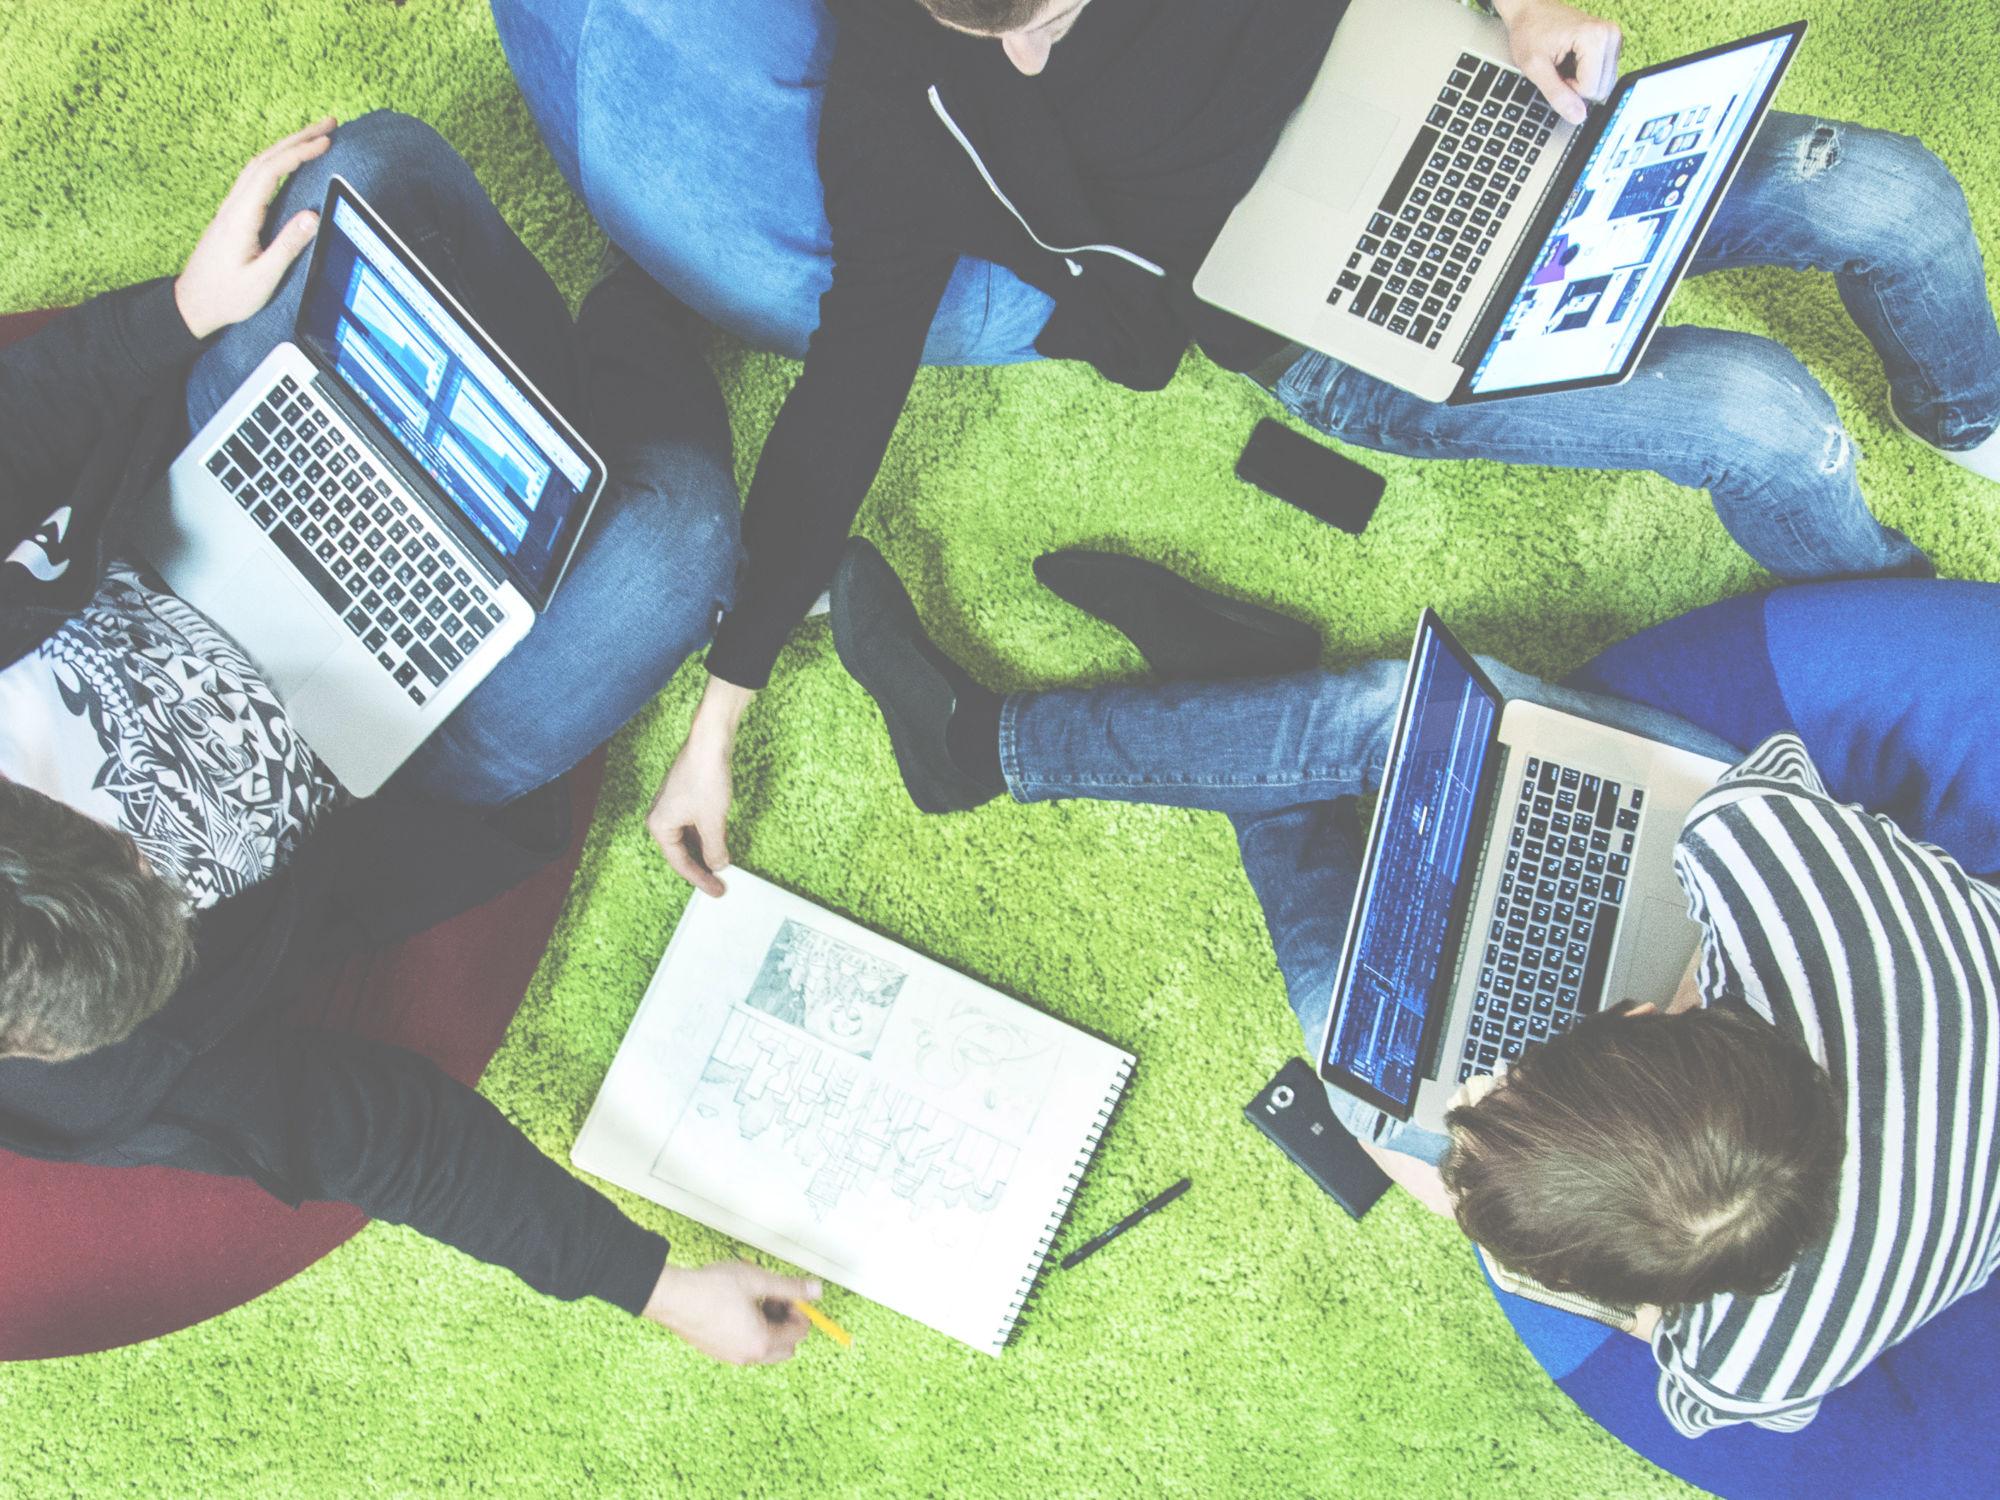 Design Workstyle. Freelance VS Teamwork.